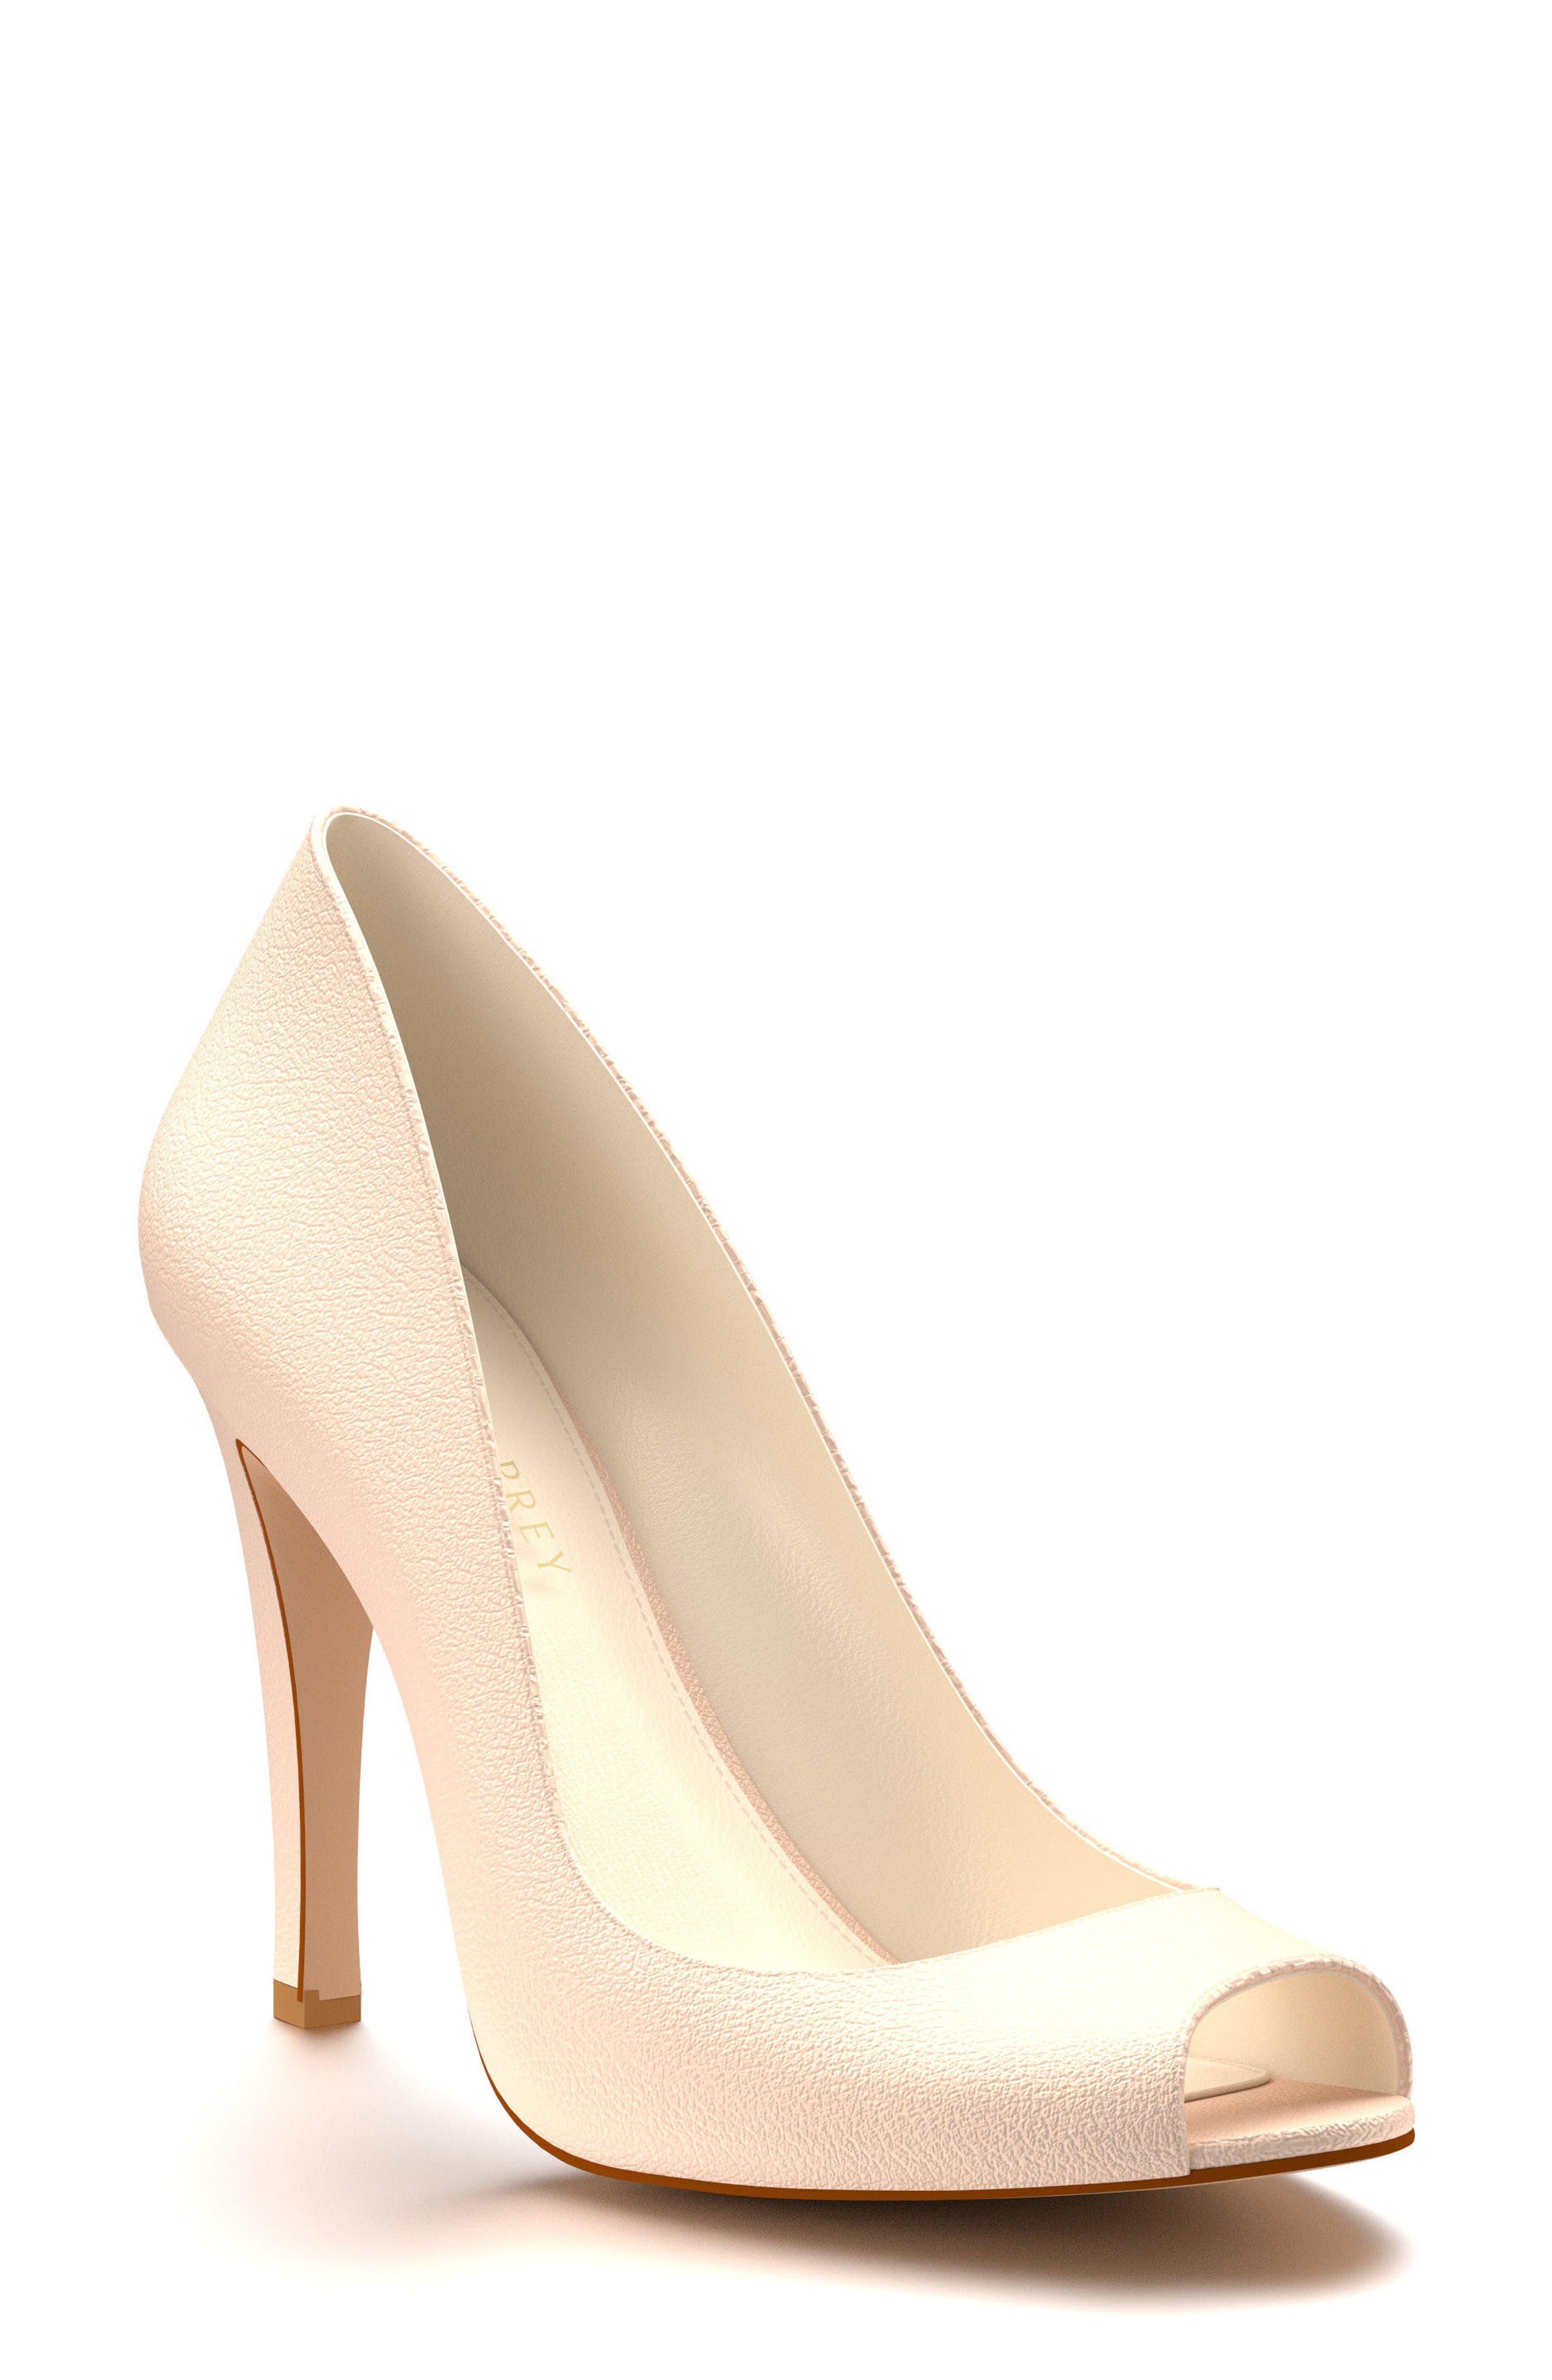 Shoes of Prey Peep Toe Pump (Women)